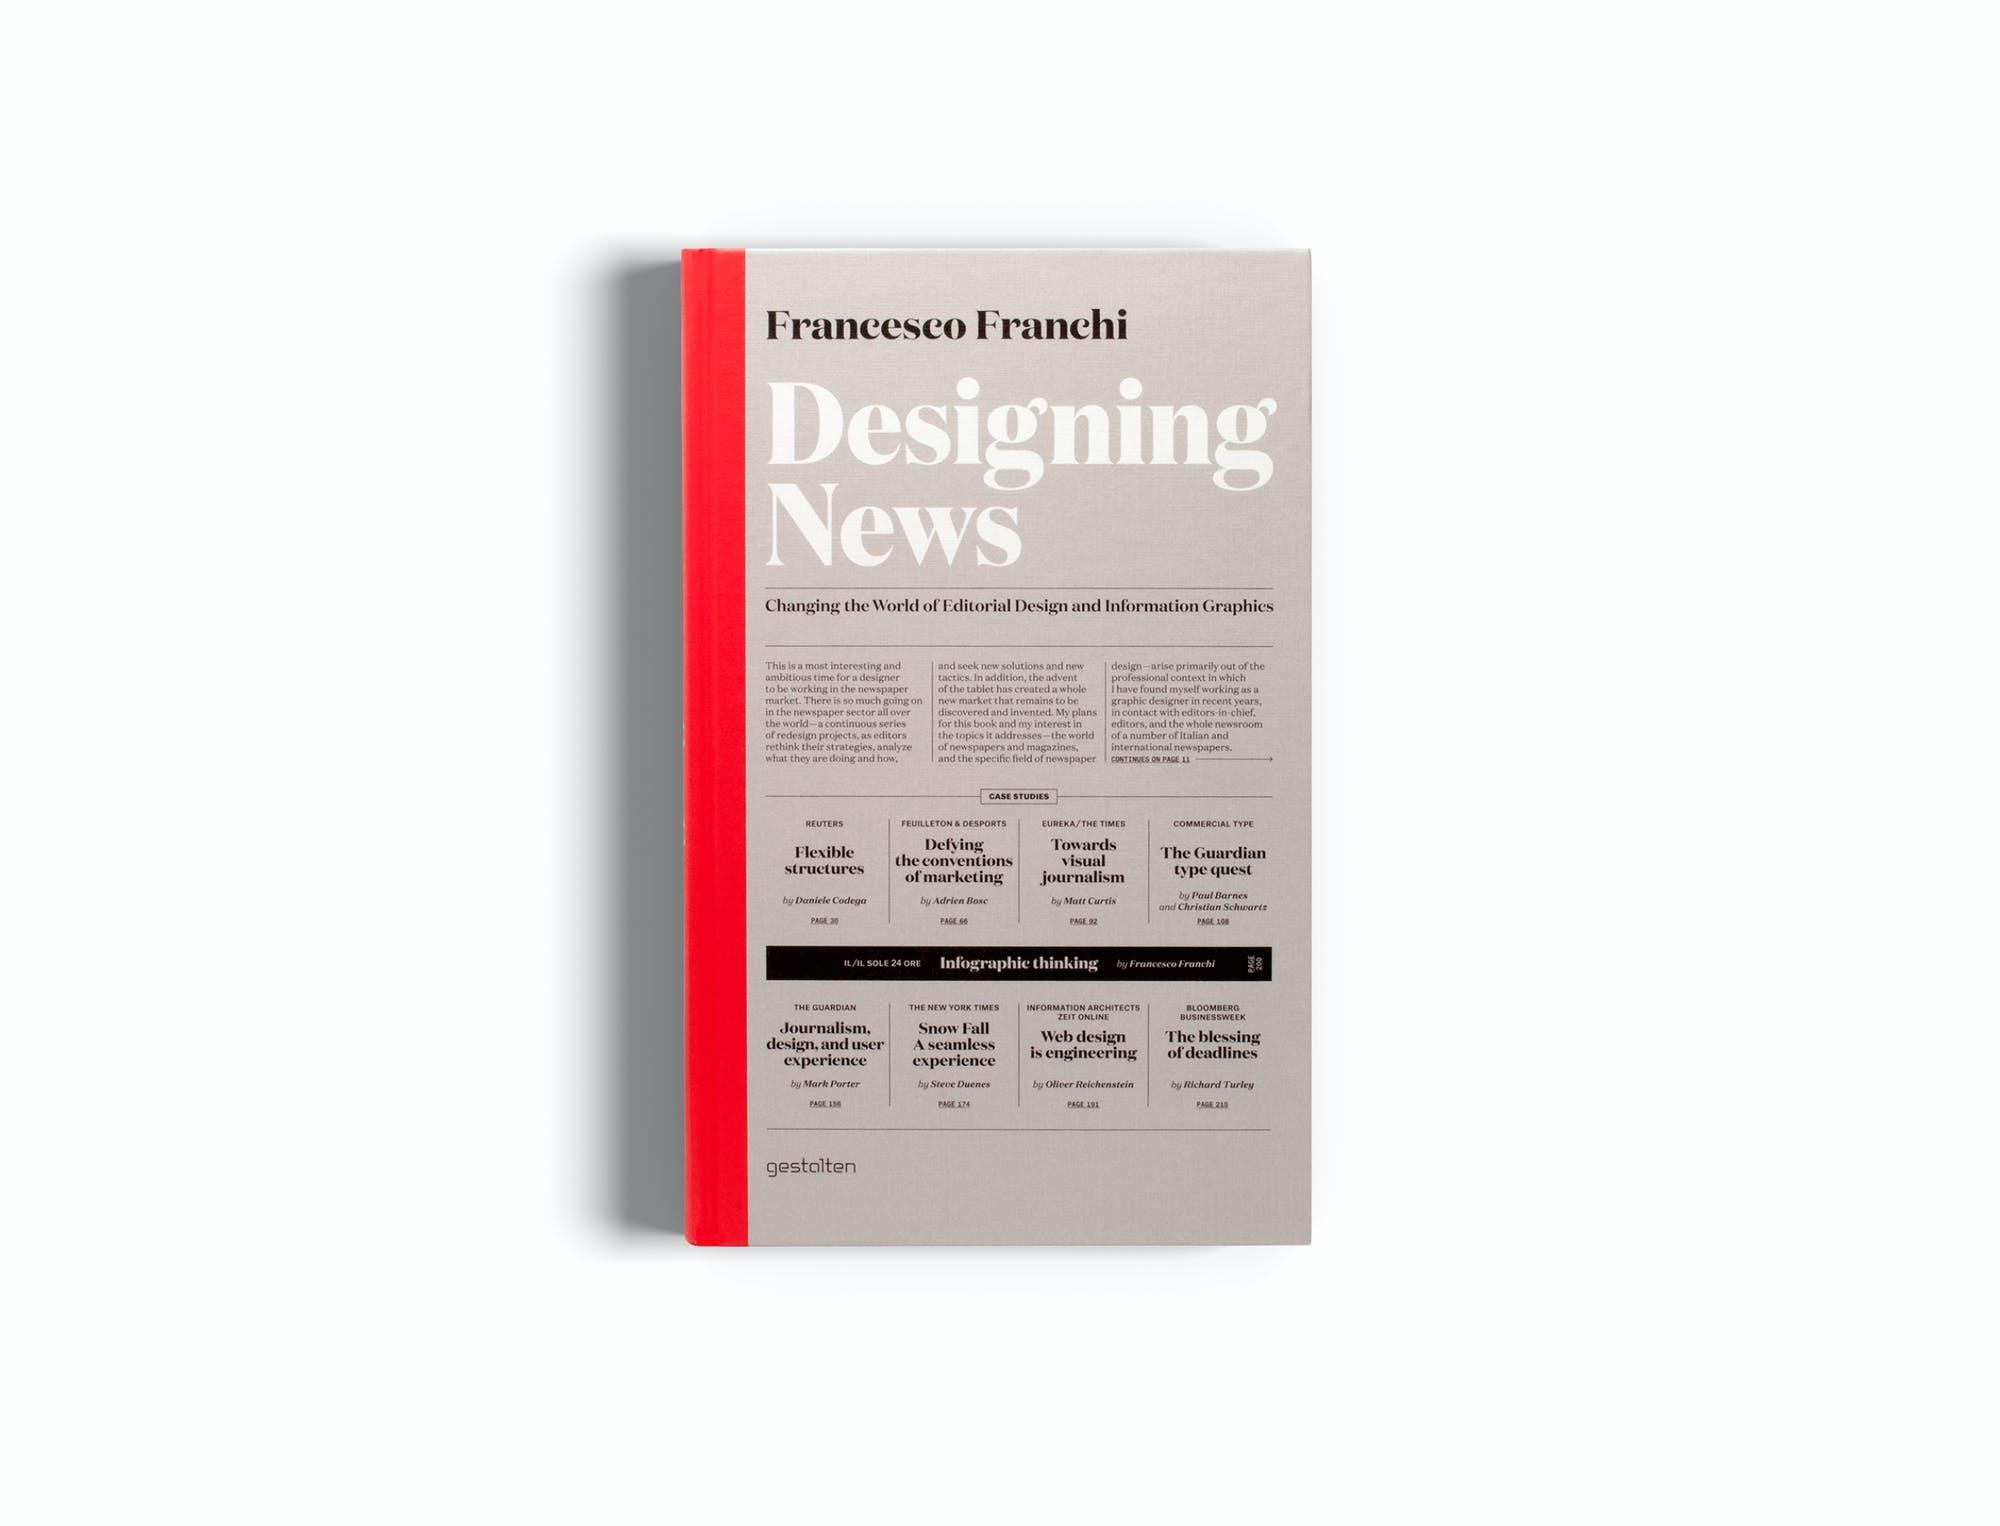 designing news book